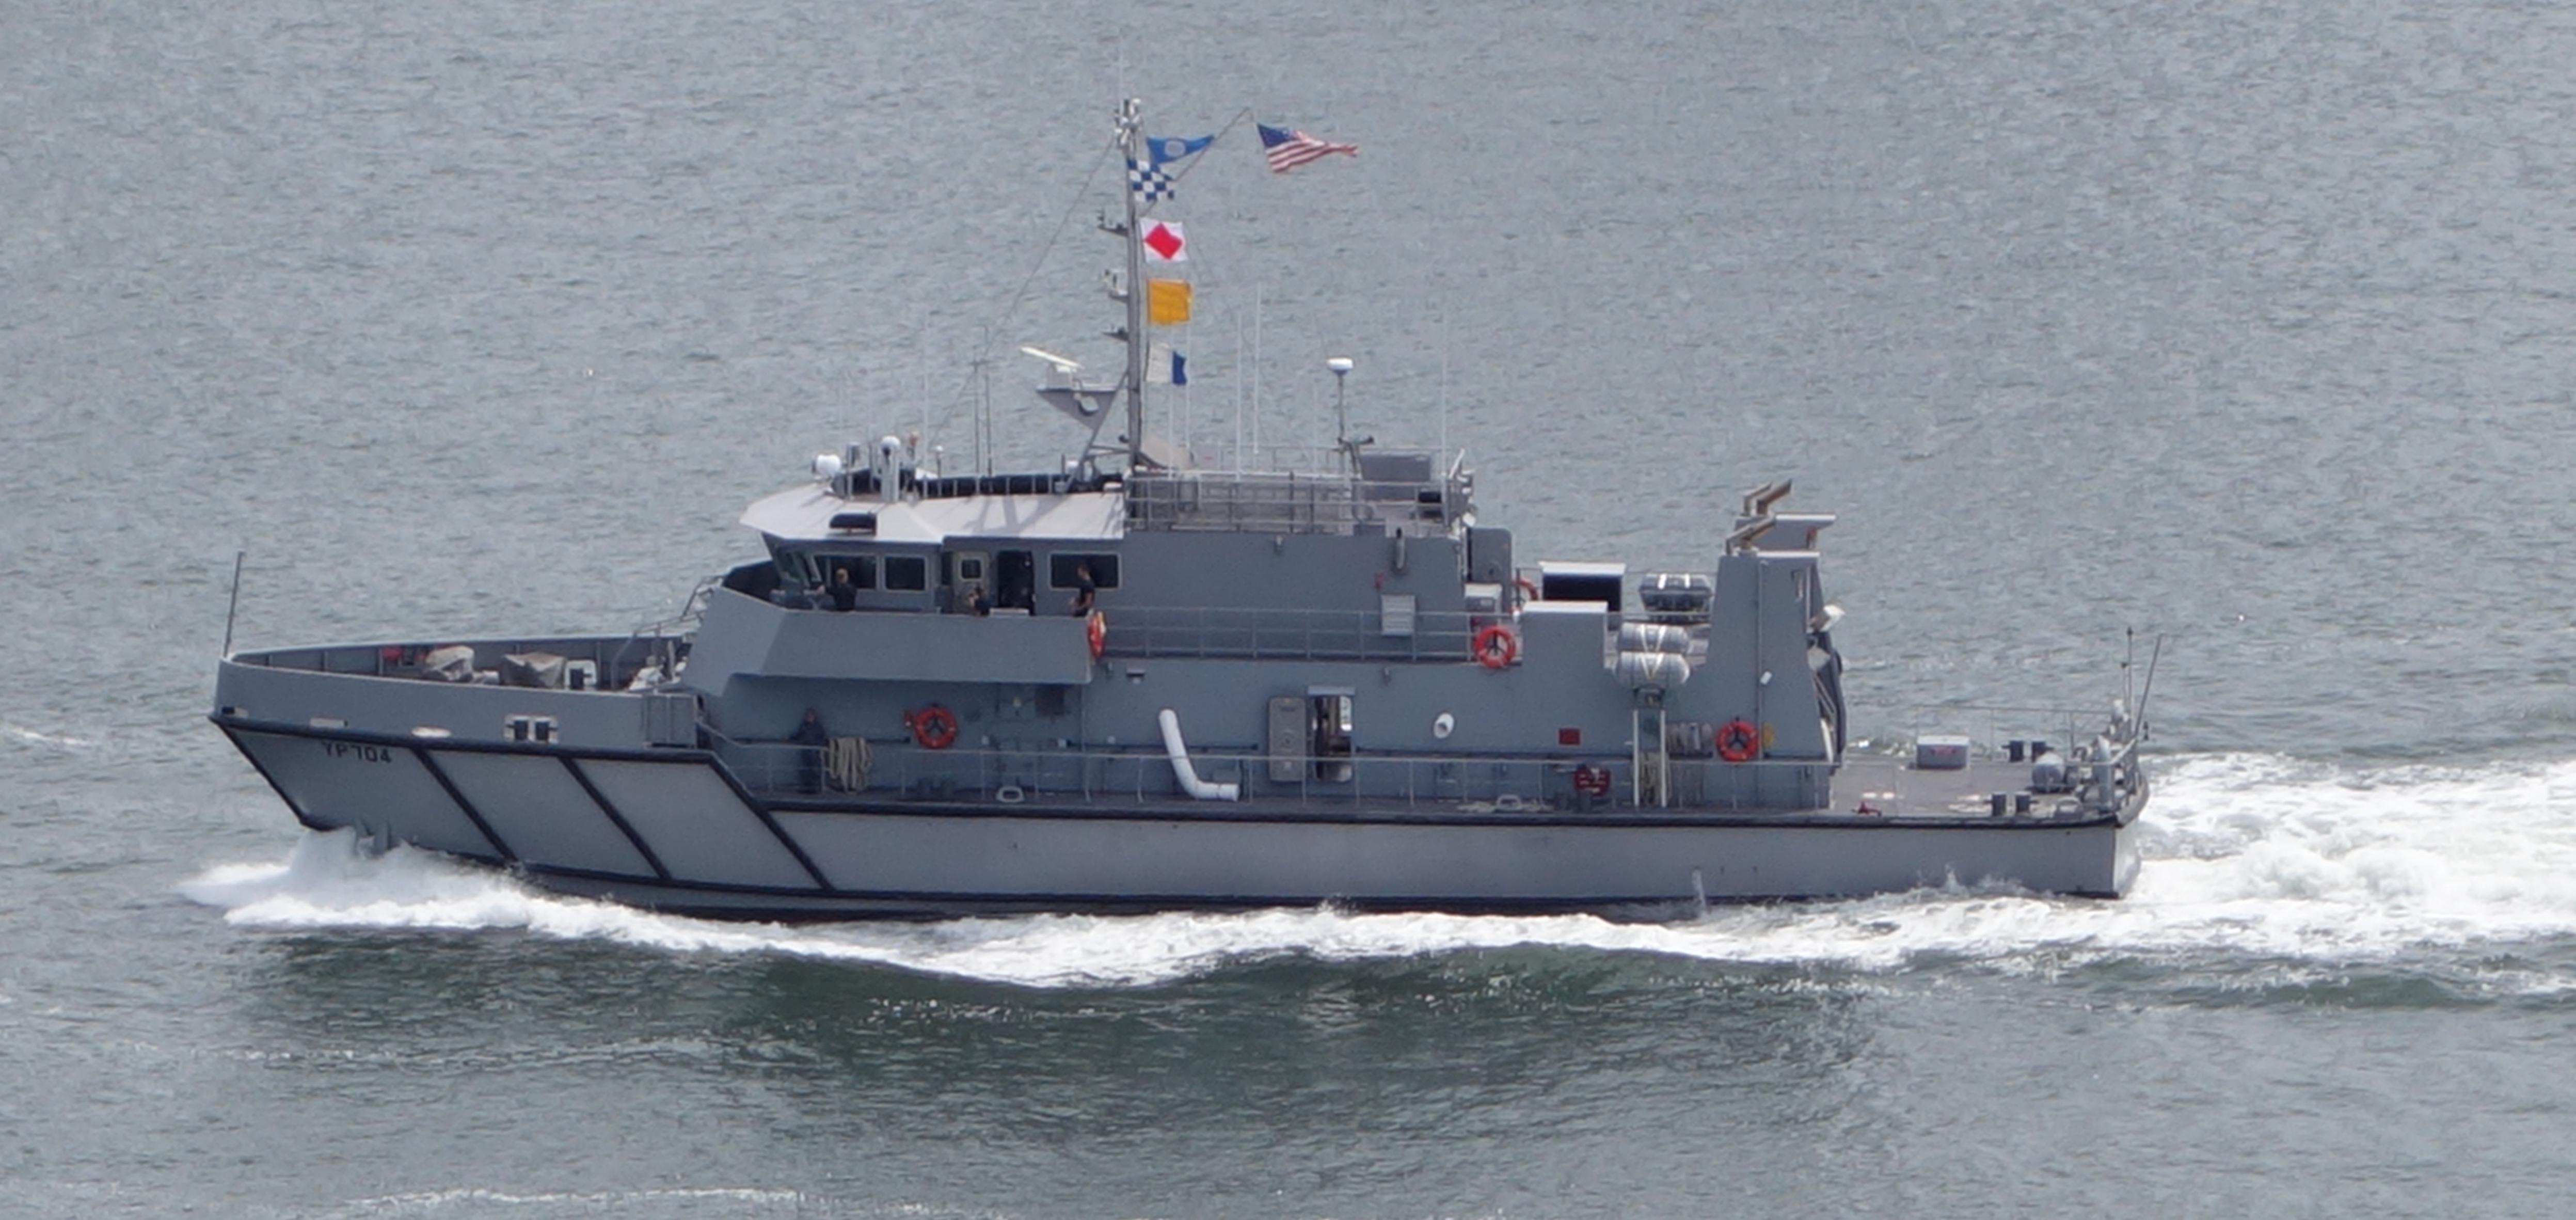 Yard patrol boat - Wikipedia